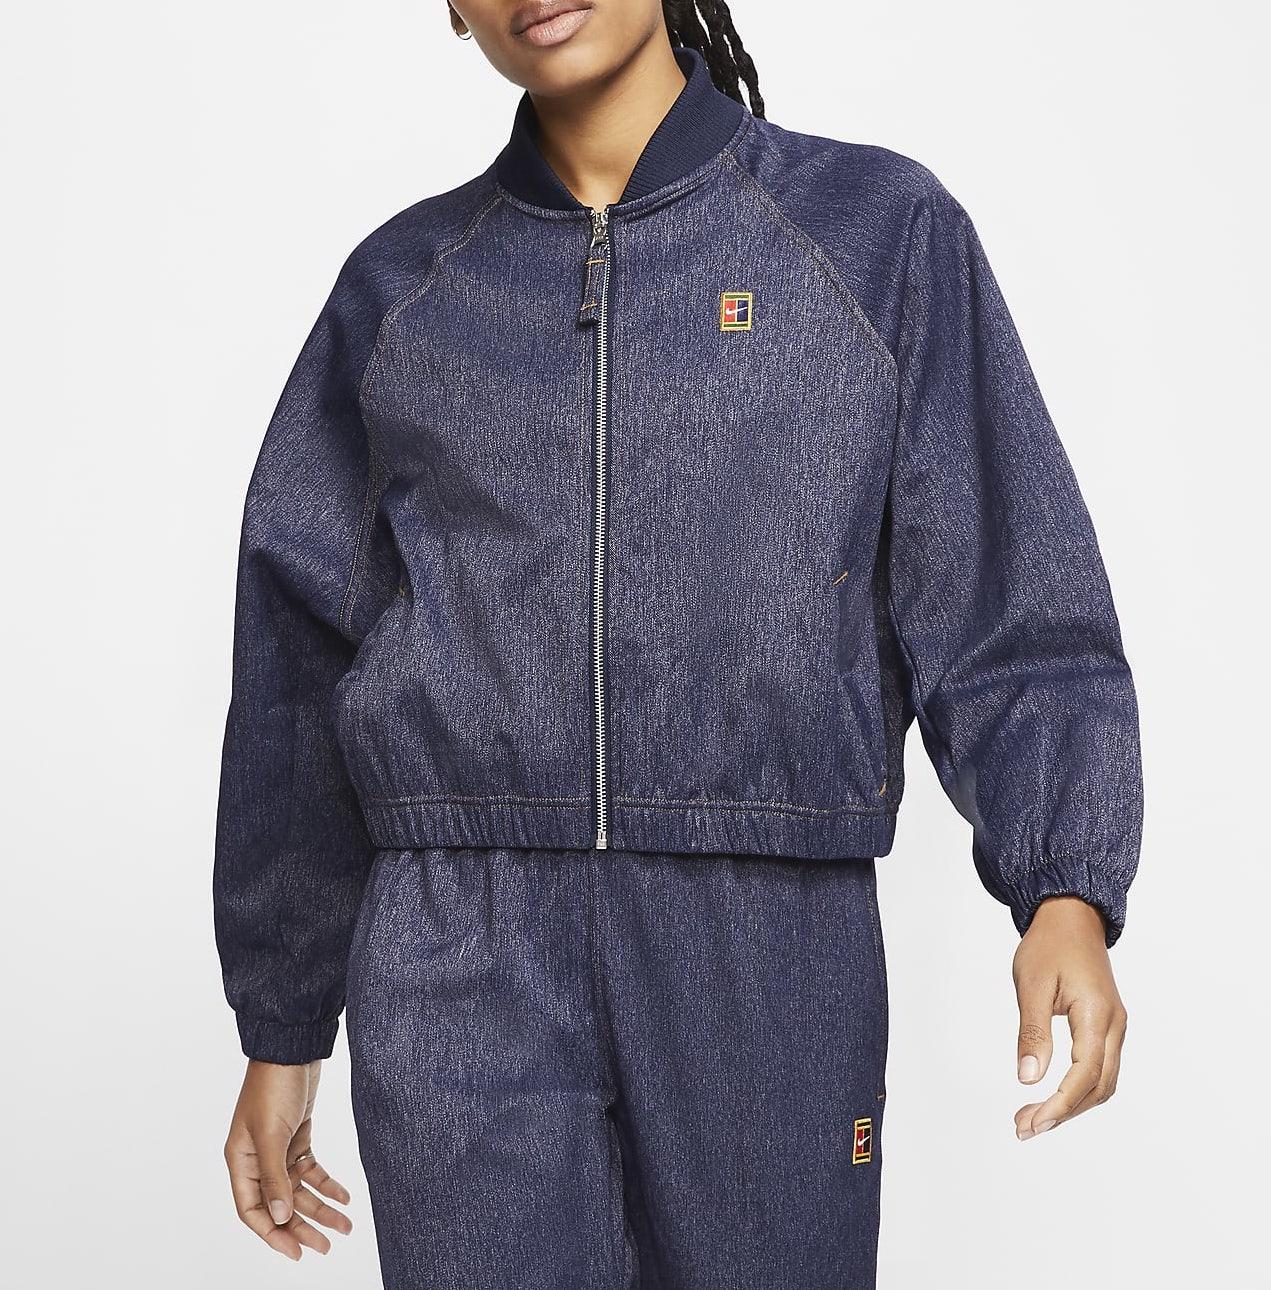 NikeCourt Tennis Jacket Obsidian